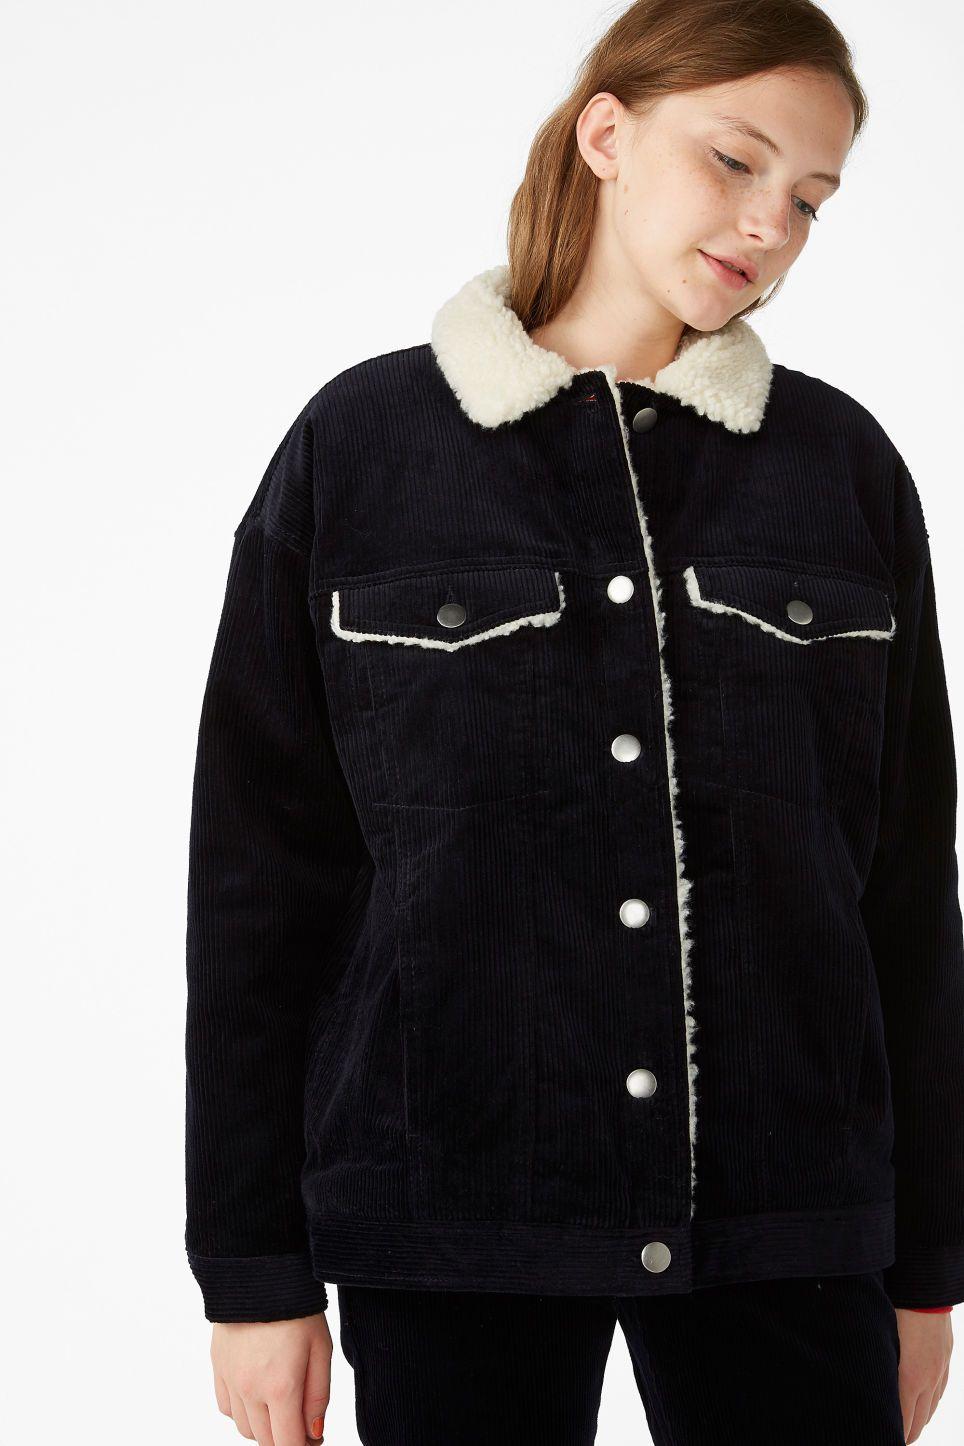 7925bb6e3 Corduroy utility jacket - Midnight hour blue - Coats & Jackets ...